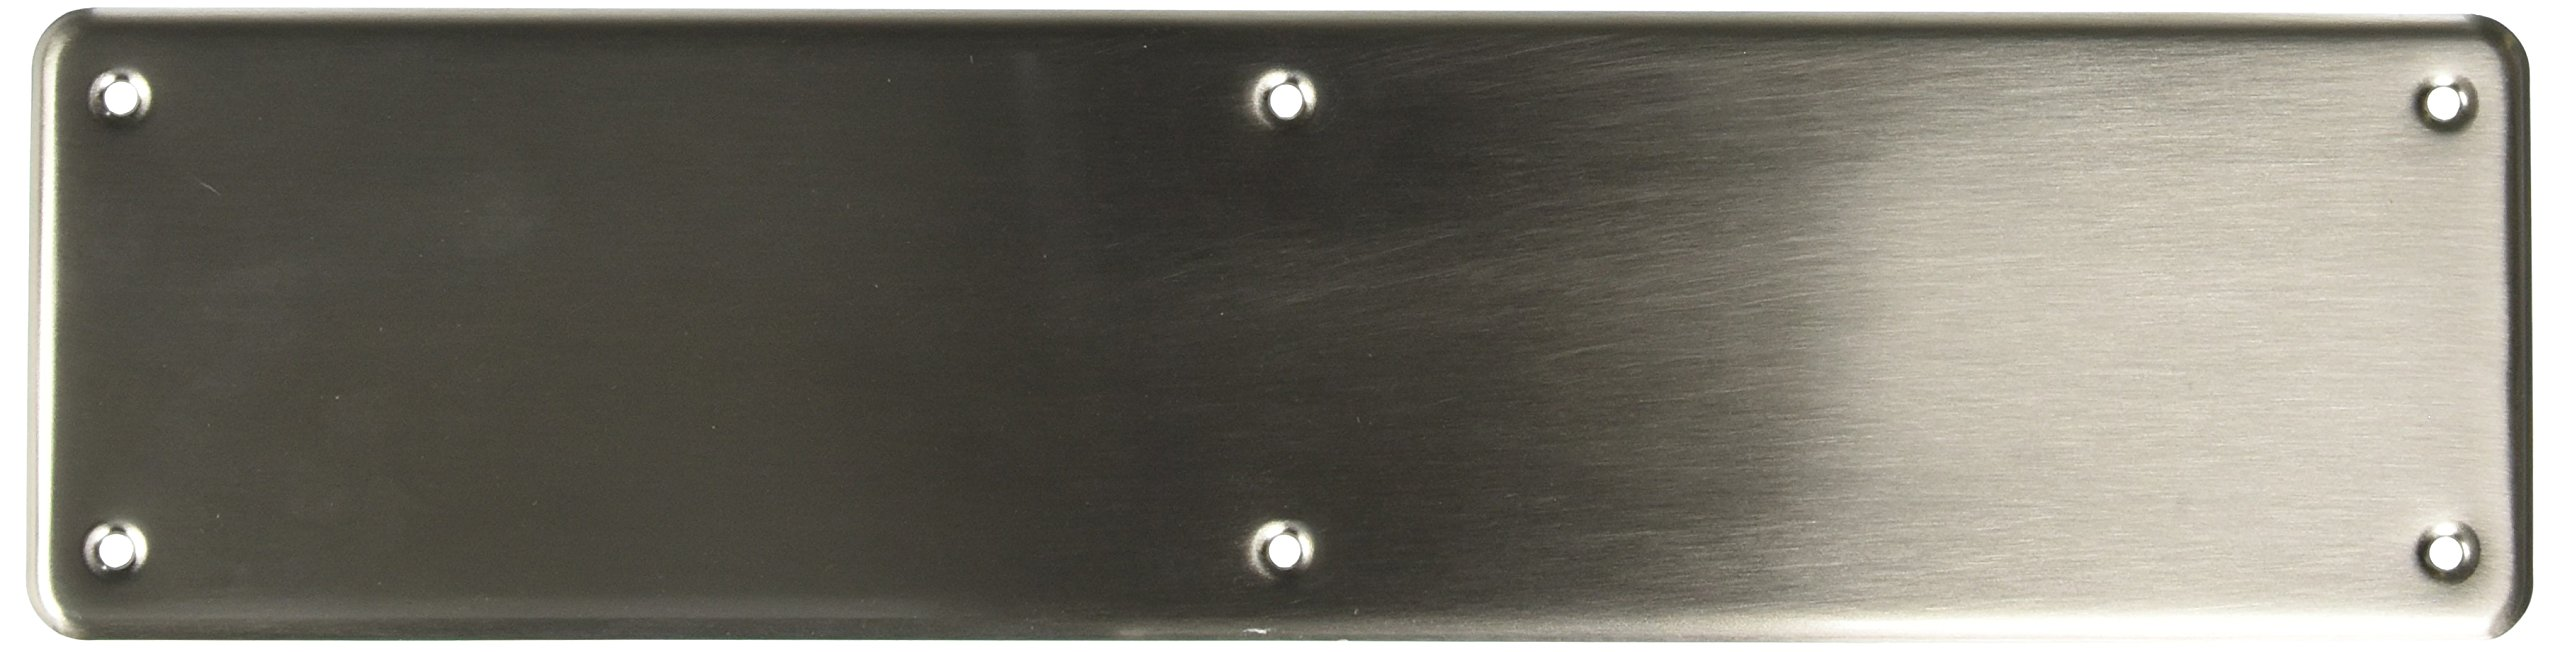 Baldwin 2115 4 Inch x 16 Inch Solid Brass Round Corner Push Plate, Satin Nickel by Baldwin